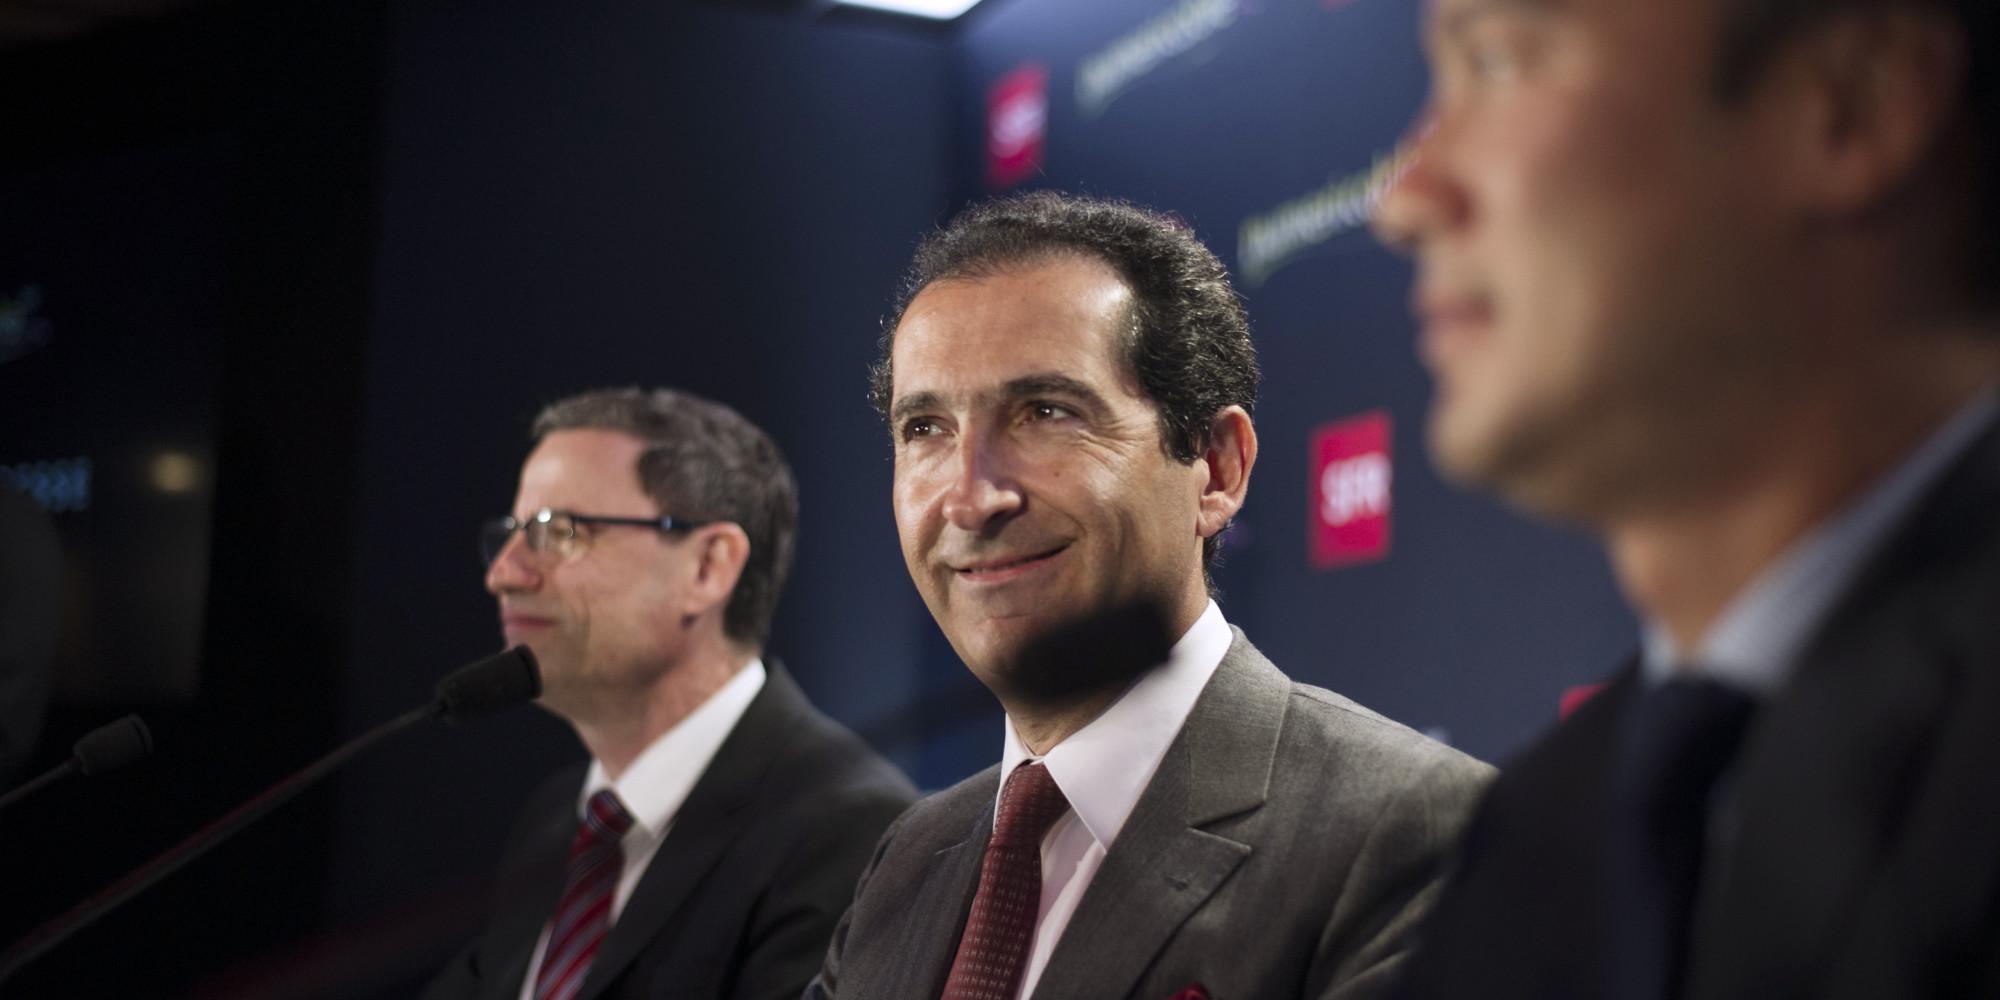 Patrick drahi l 39 expert des gros coups financiers fort for Piscine xavier niel